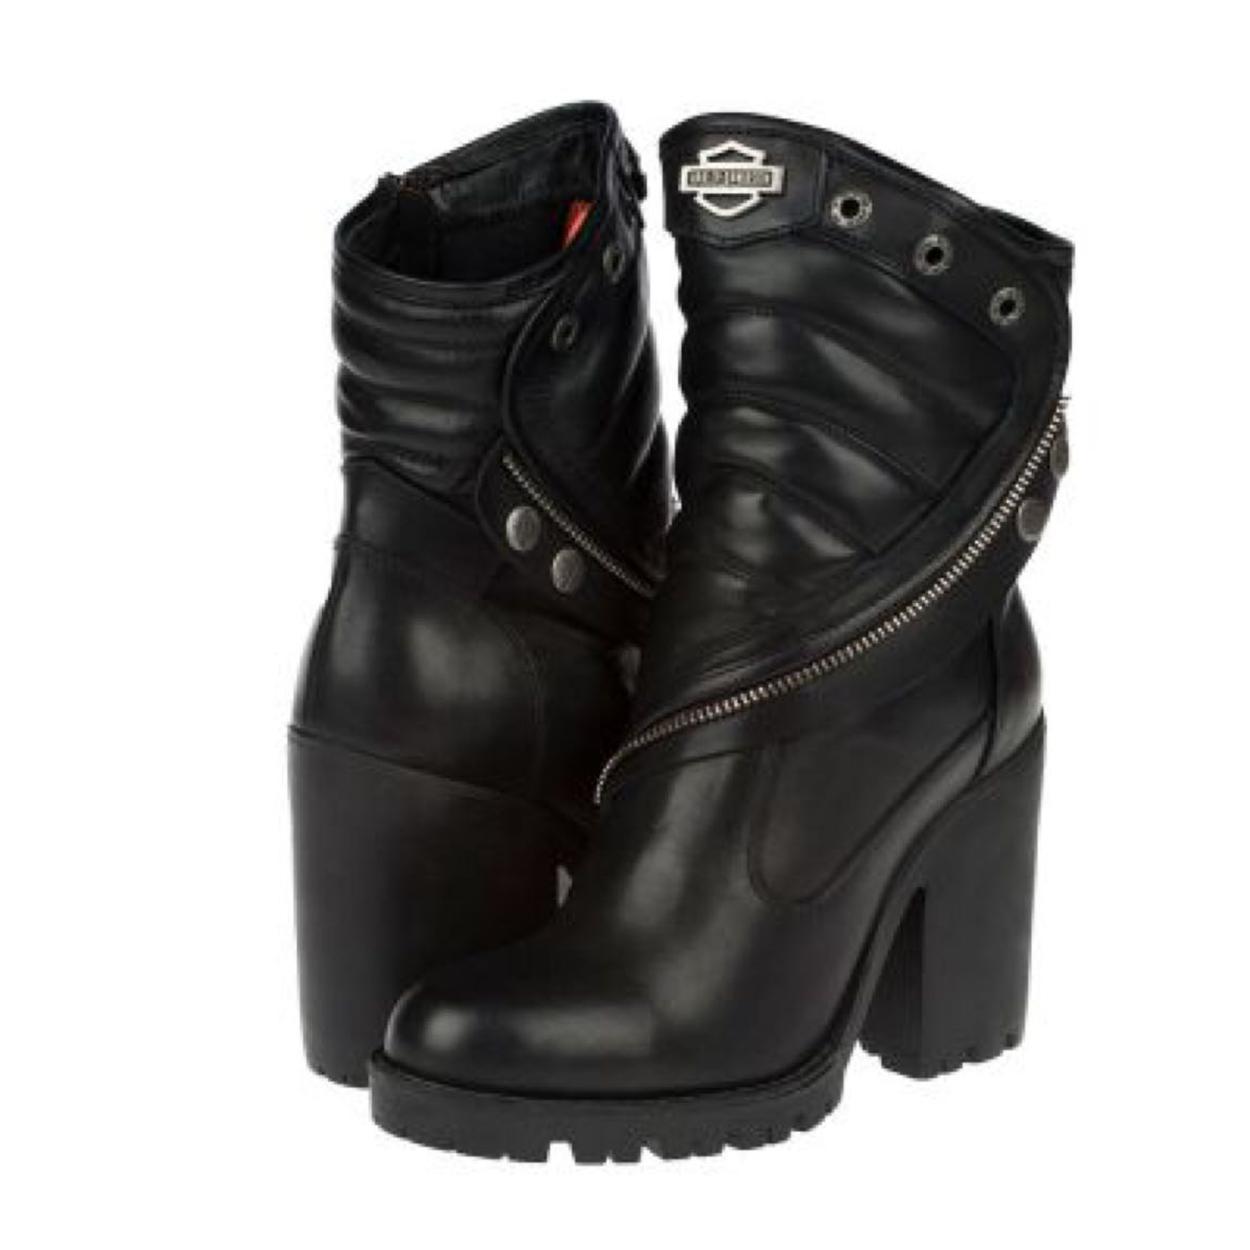 Harley Davidson Kalın topuklu